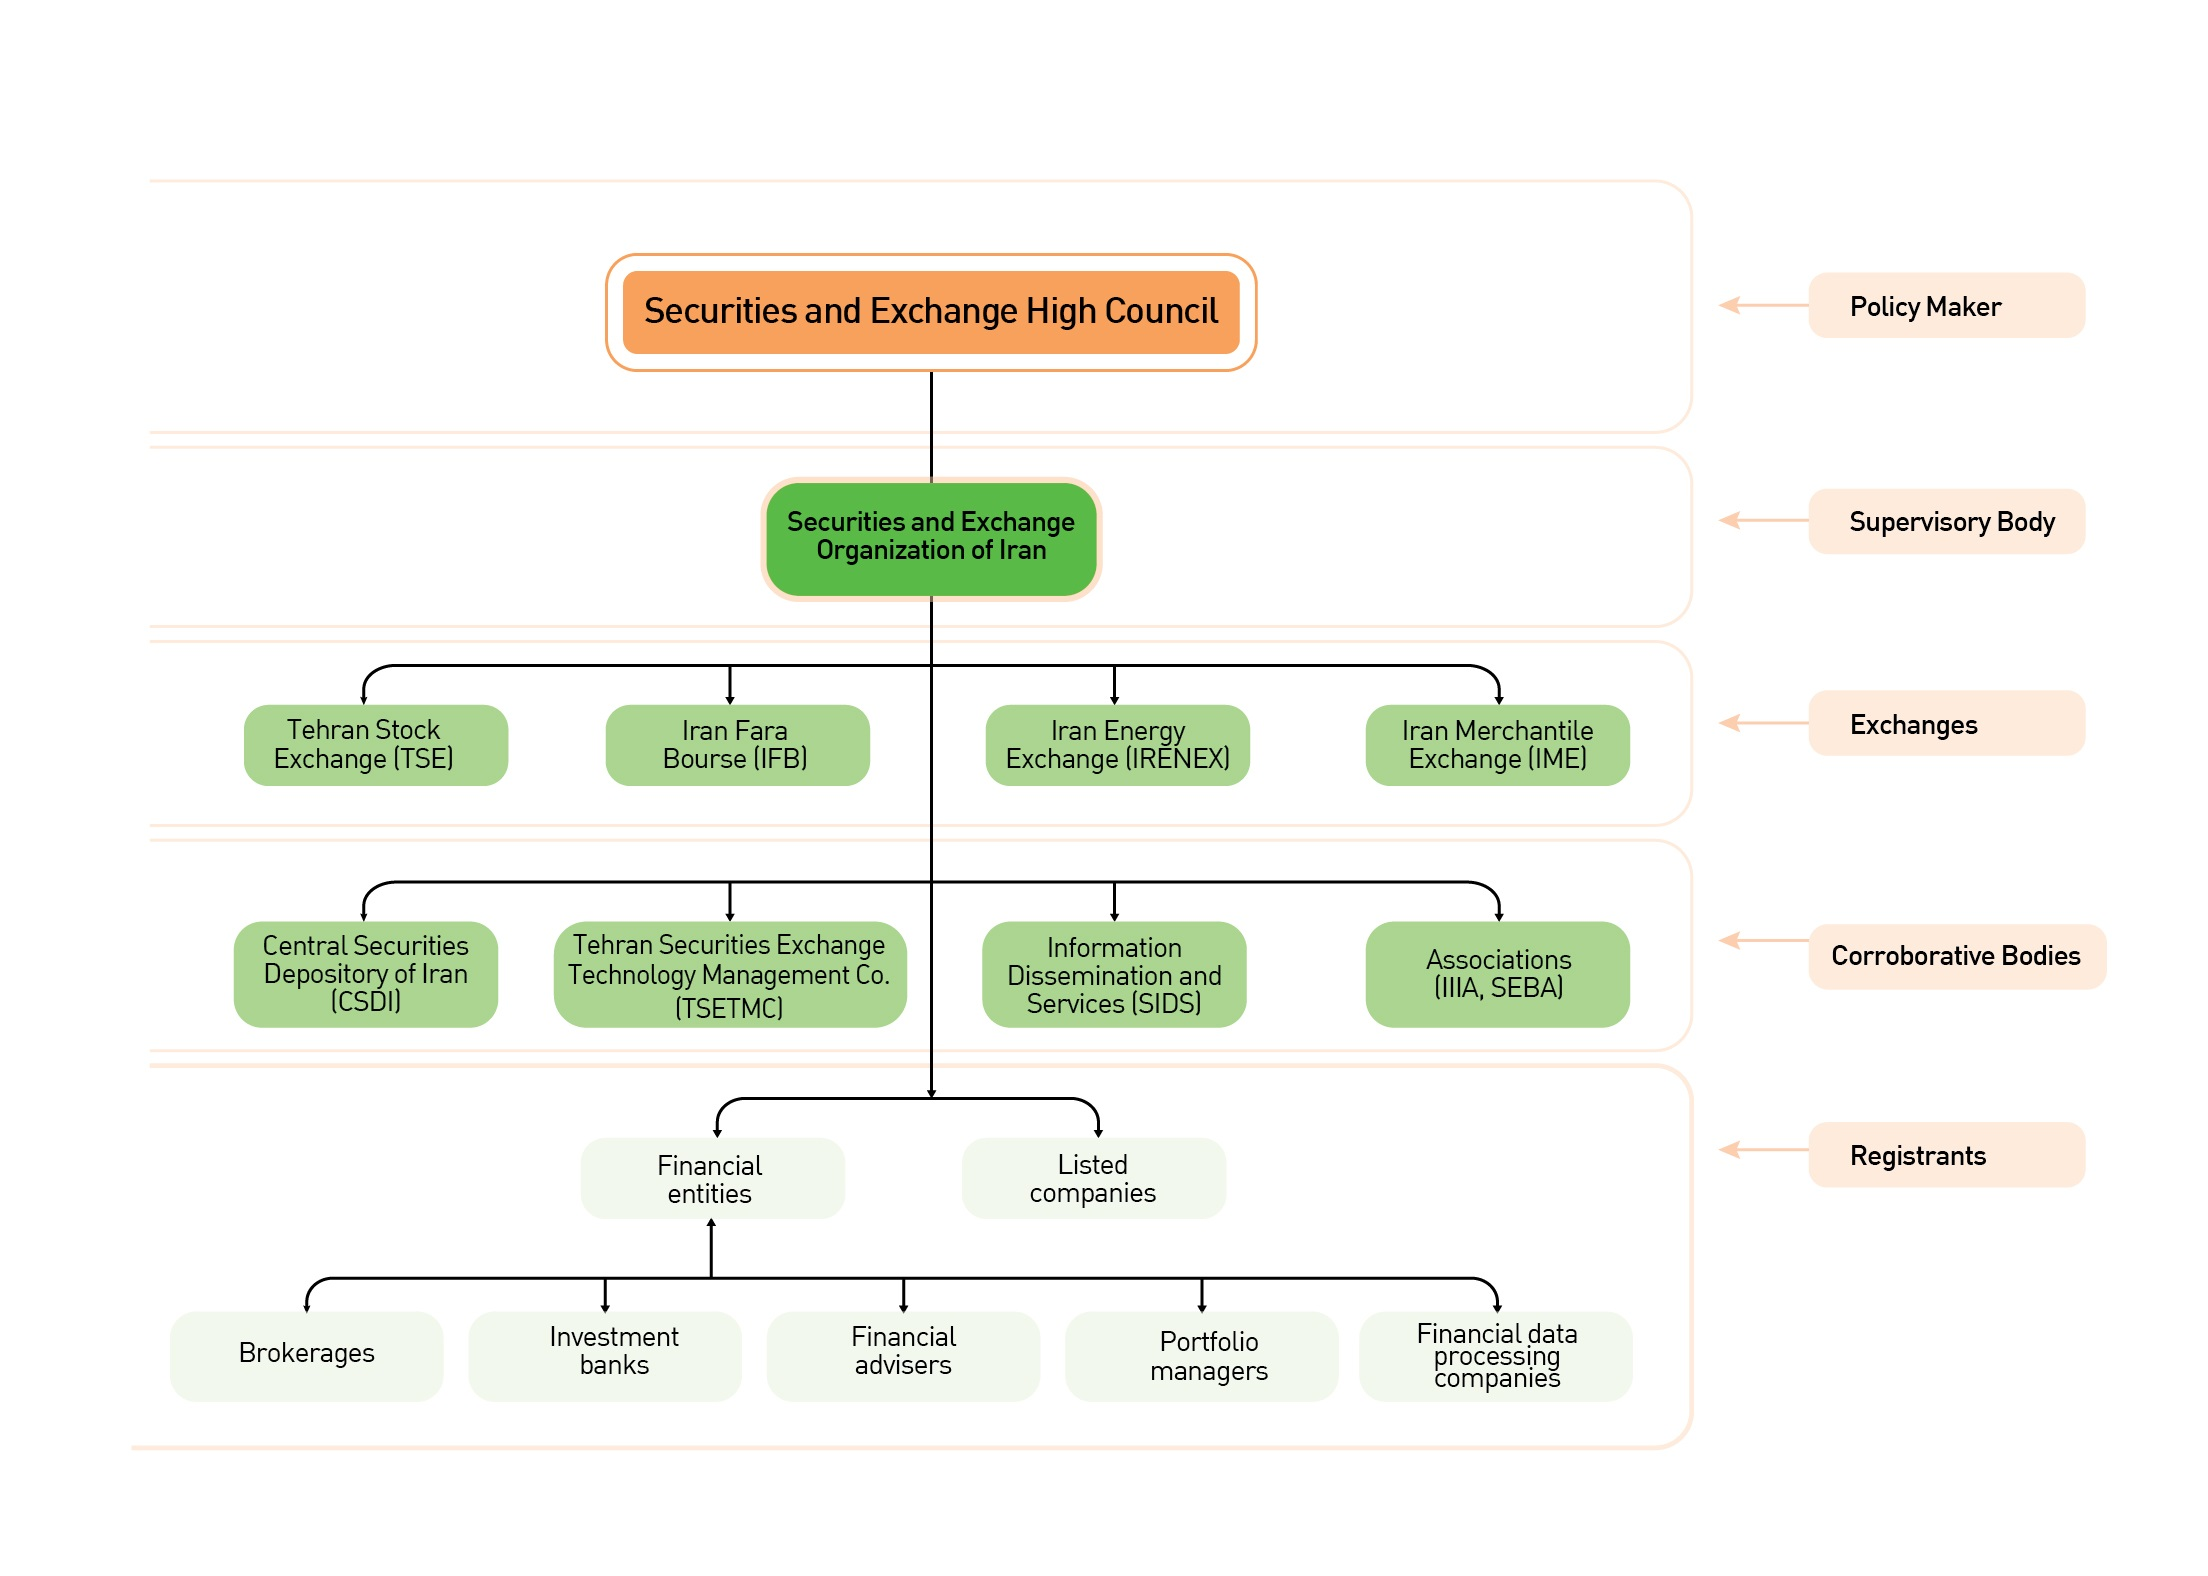 Excel Organizational Chart: Organizational Chart SEO Iran.jpg - Wikimedia Commons,Chart